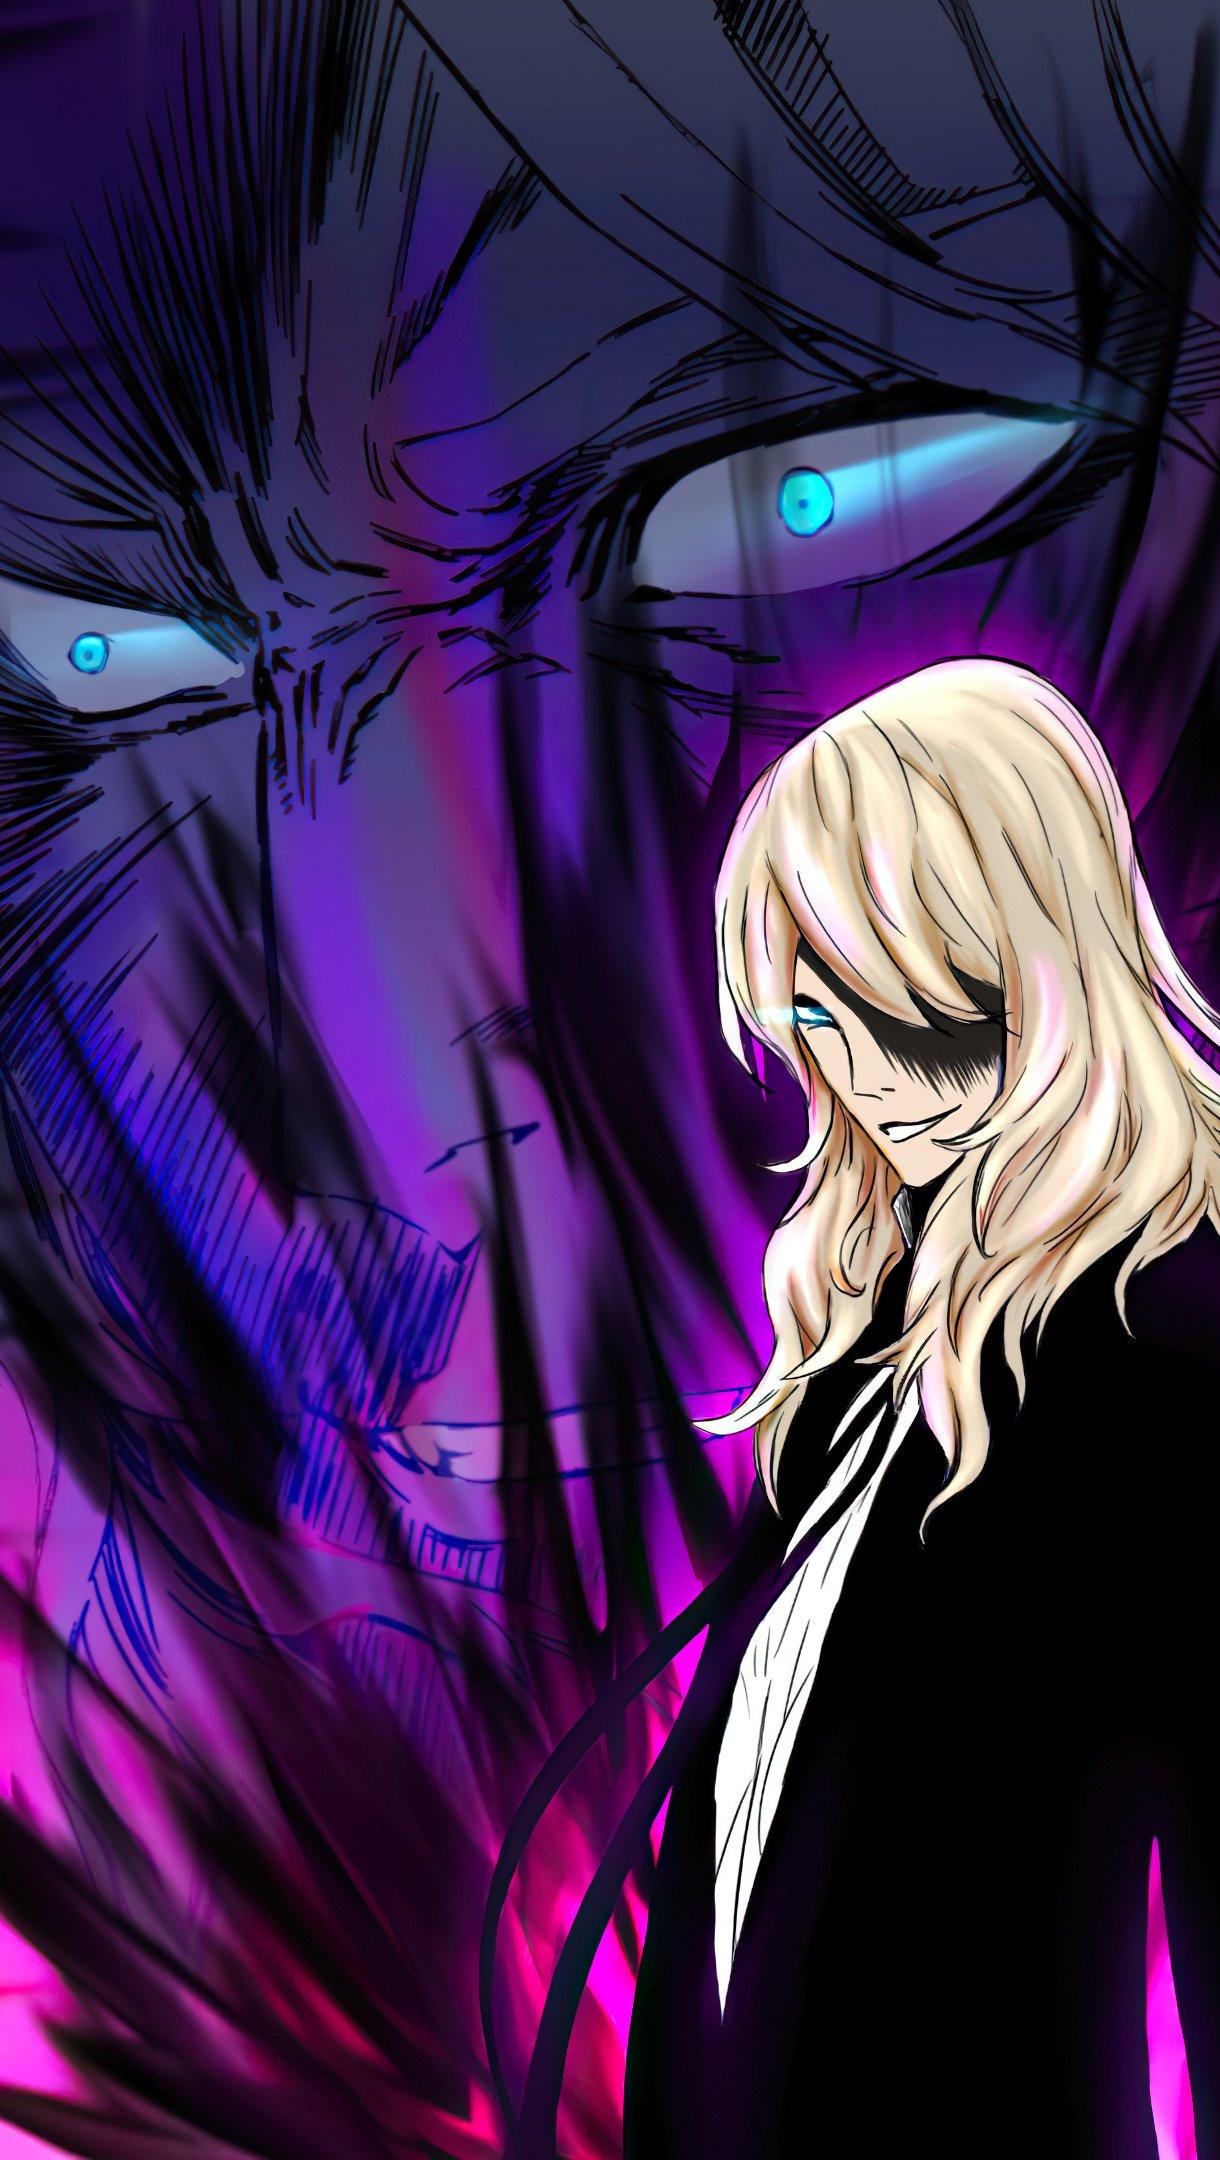 Fondos de pantalla Anime Frankenstein de Noblesse Vertical